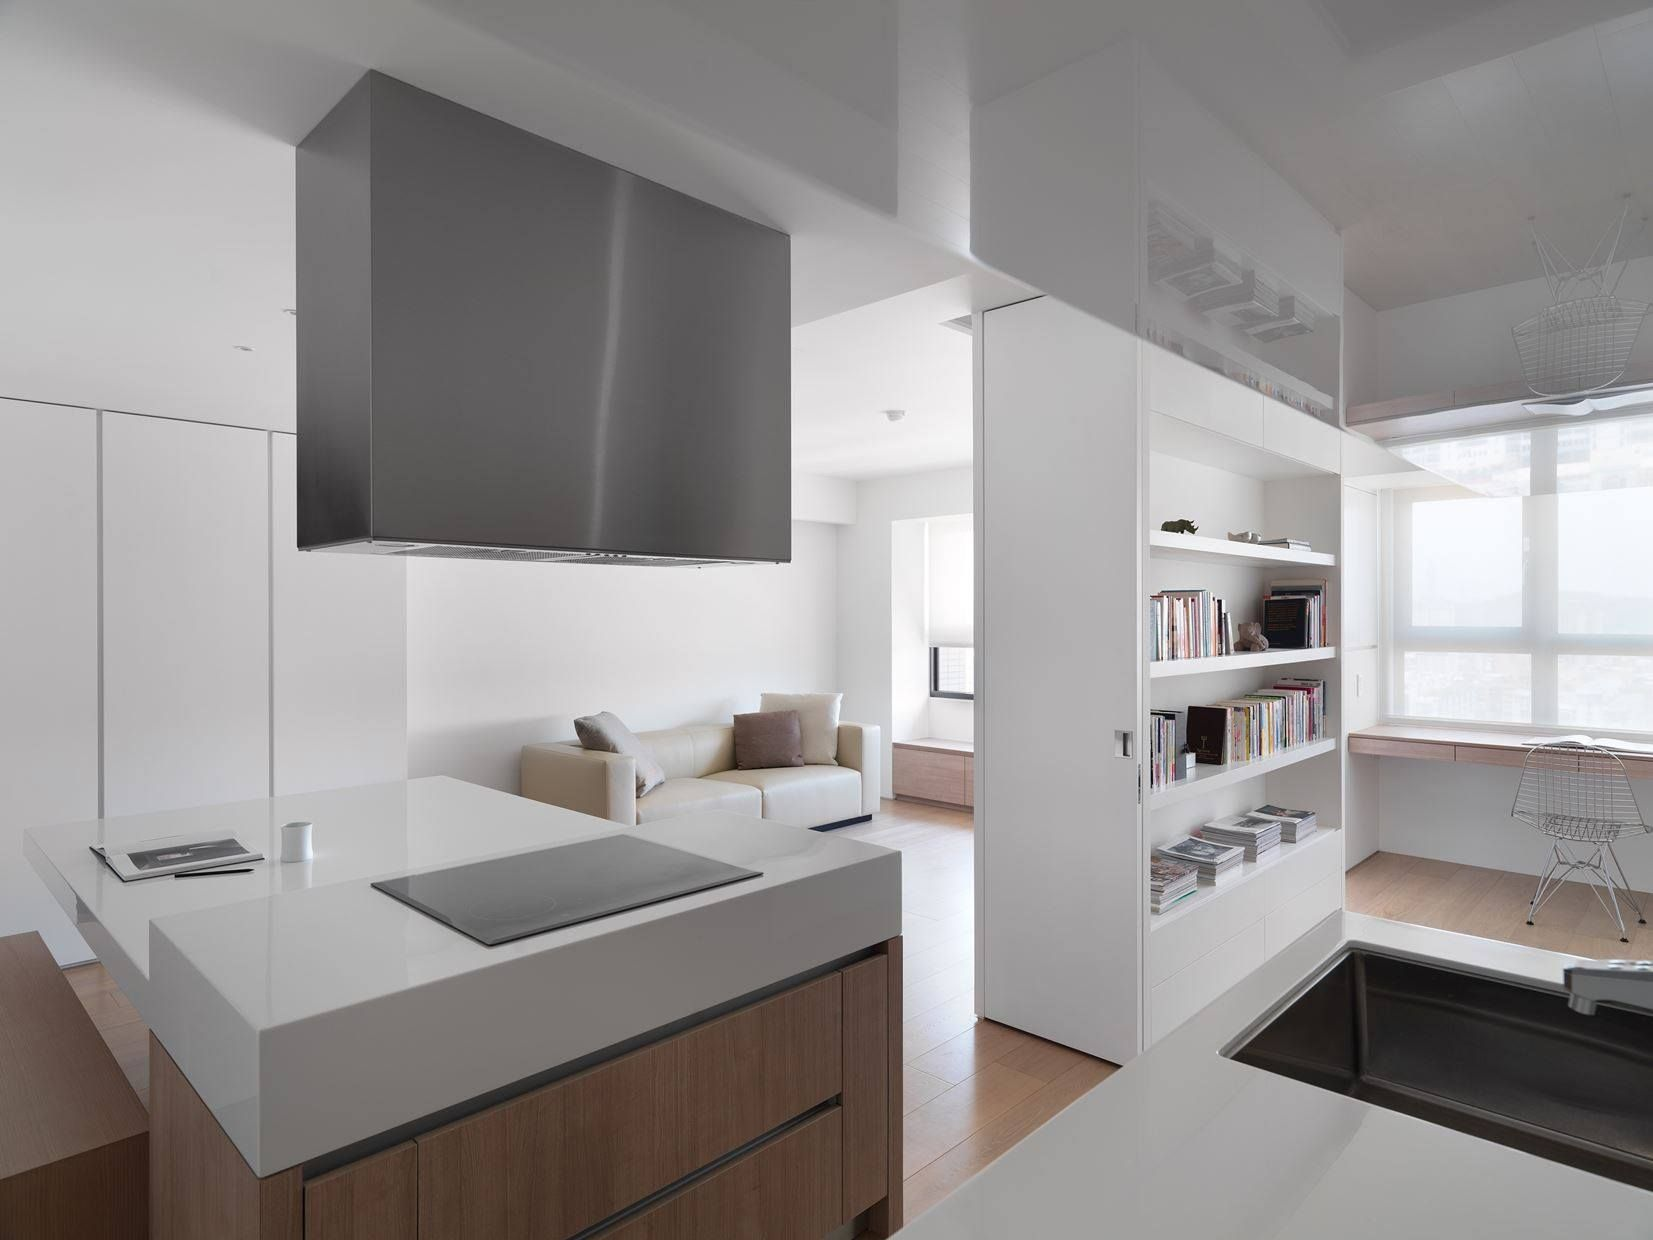 Explore Kitchen Modern, Minimalist Interior And More